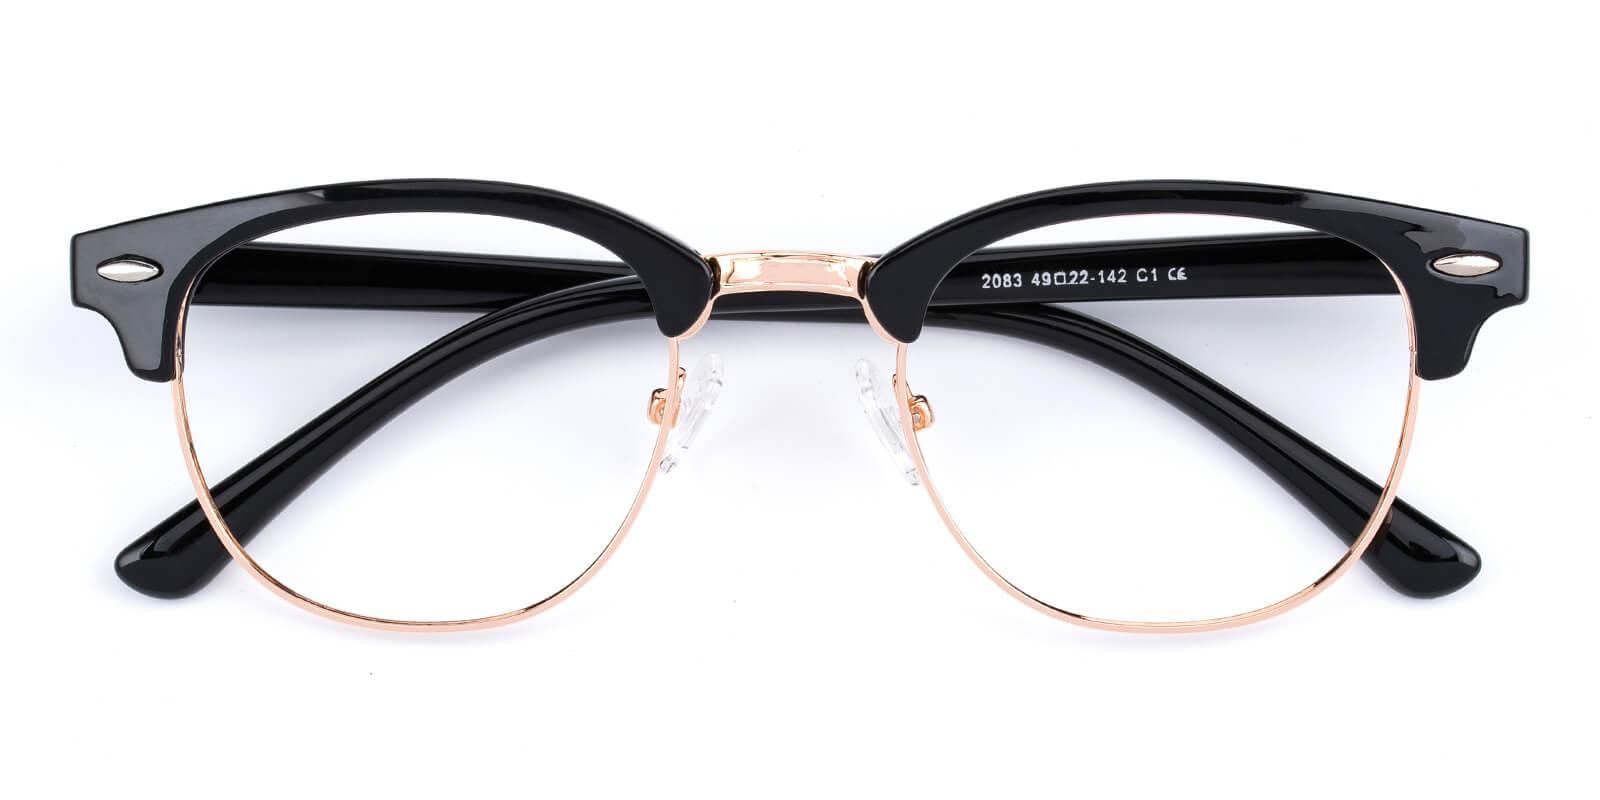 Creative-Black-Browline-Metal / Combination / Plastic-Eyeglasses-detail